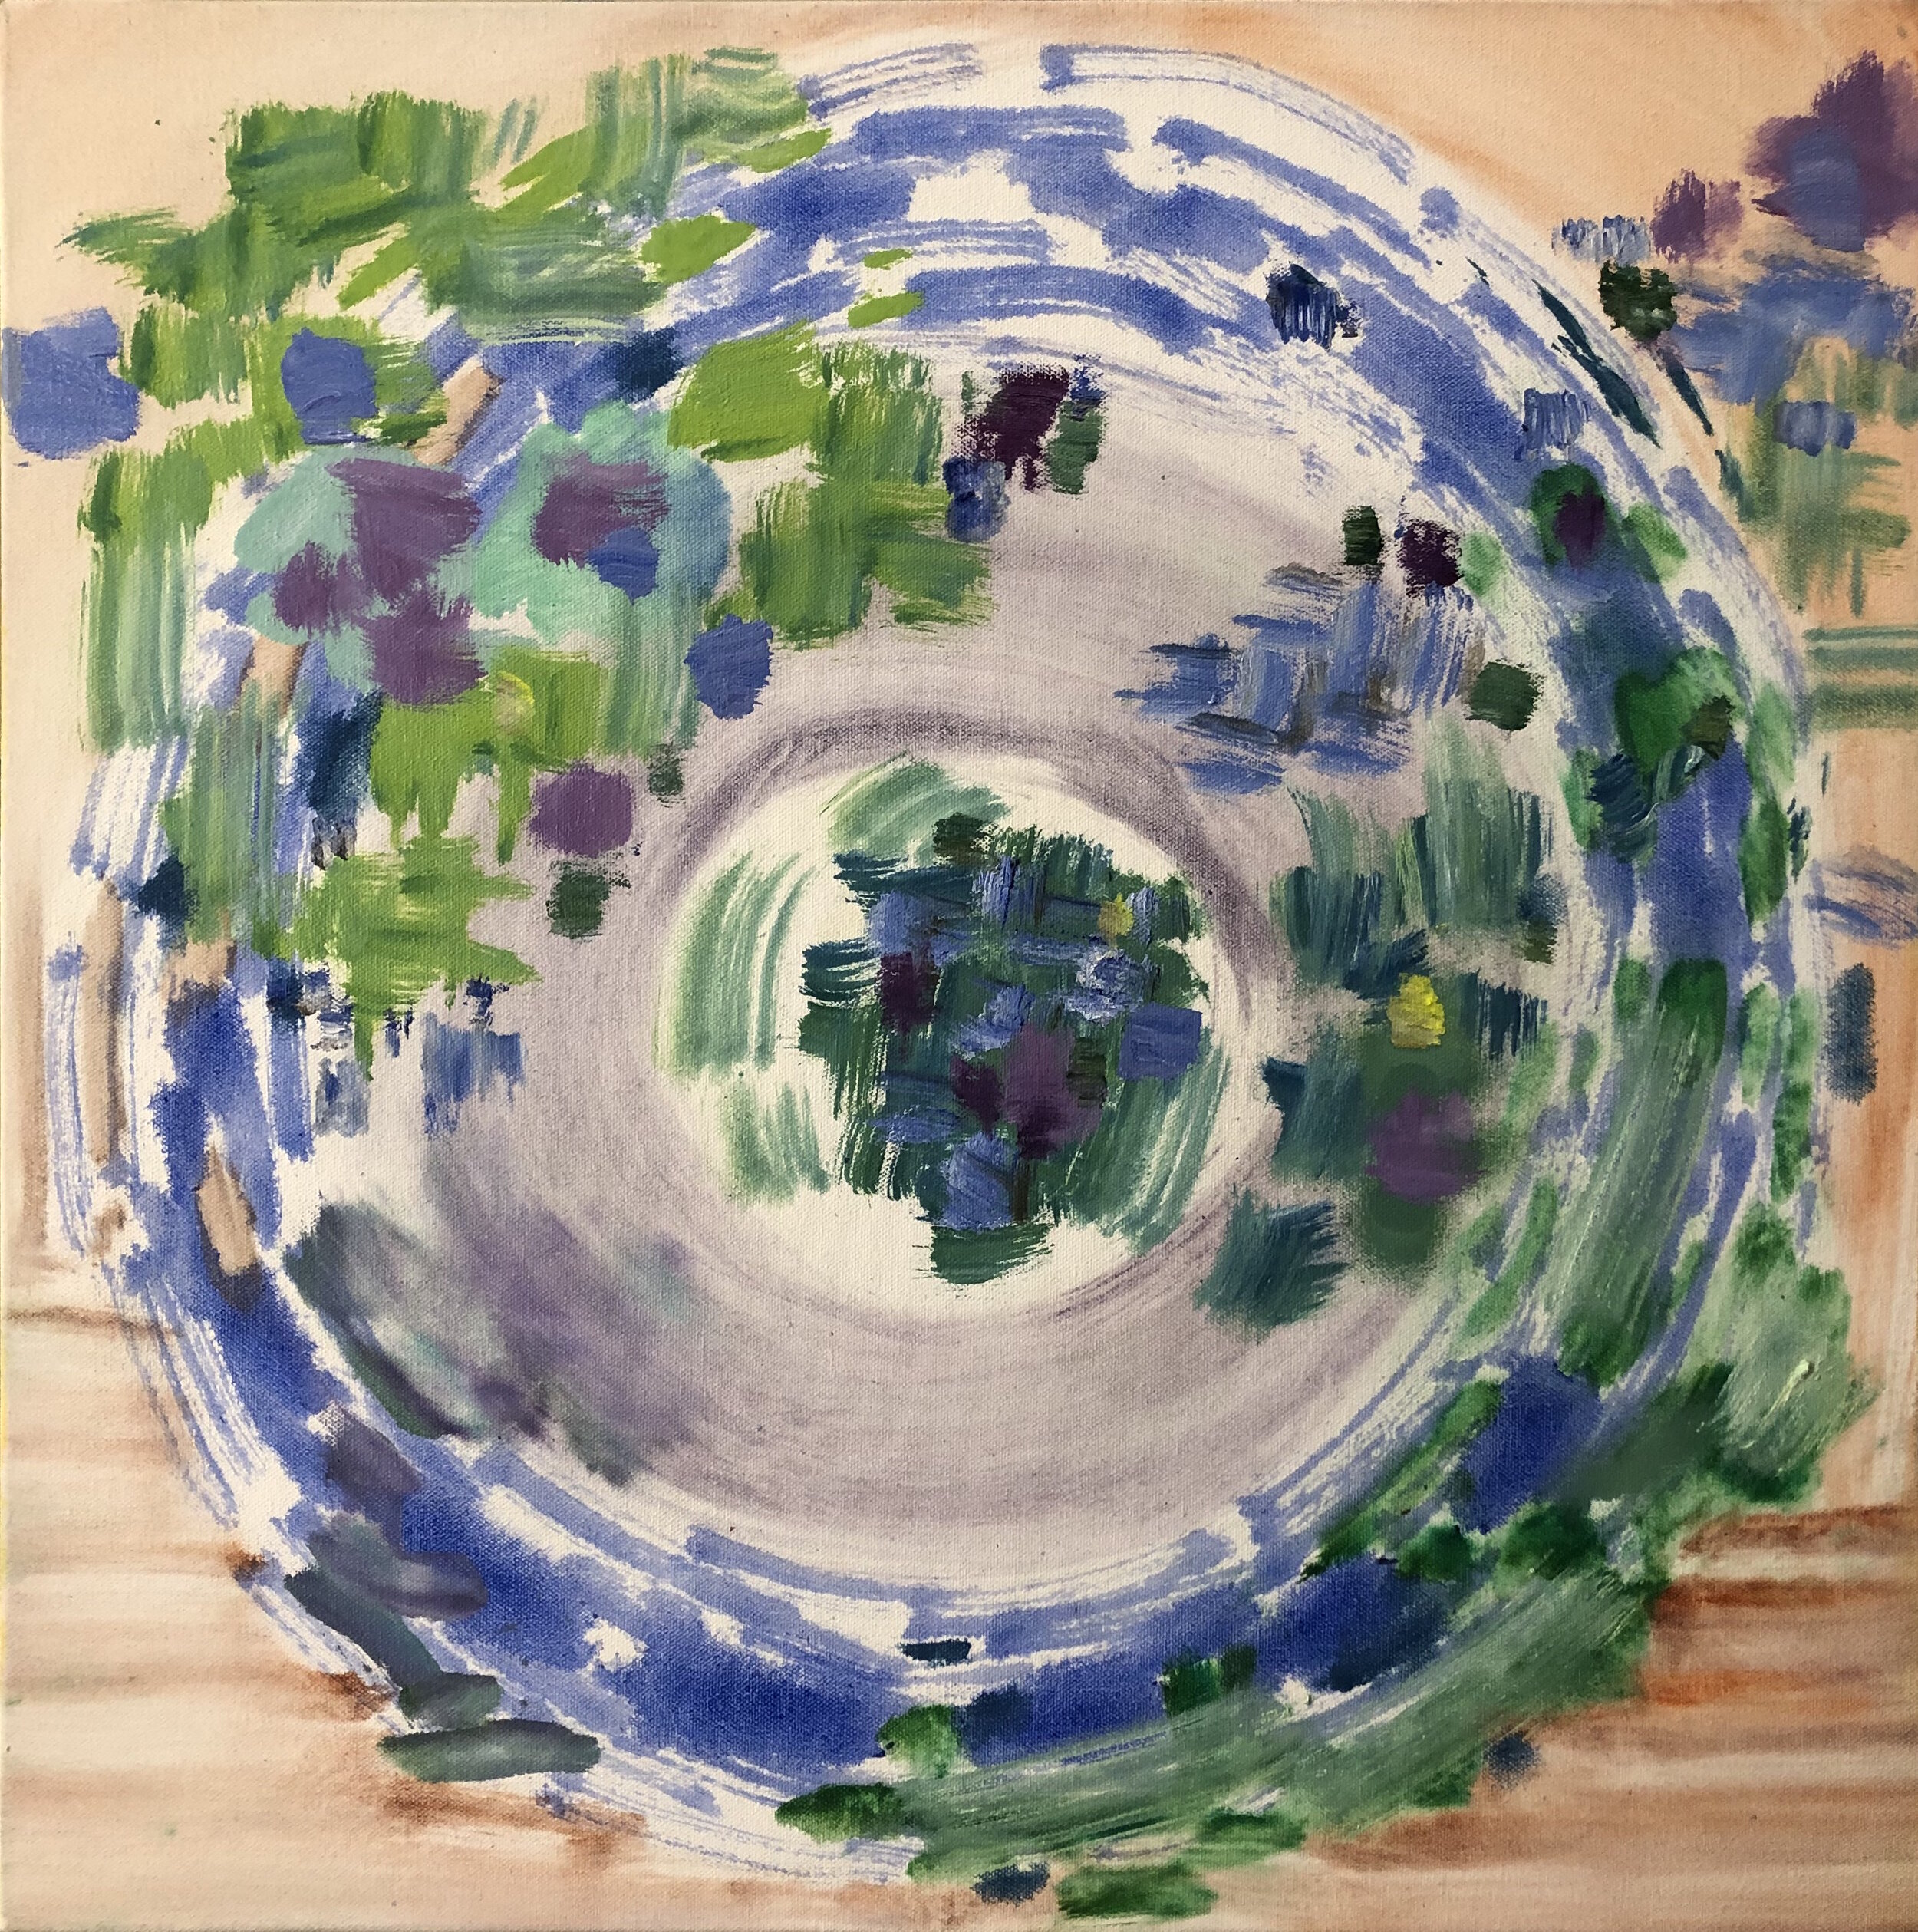 Composition Tan Blue Green, 2019